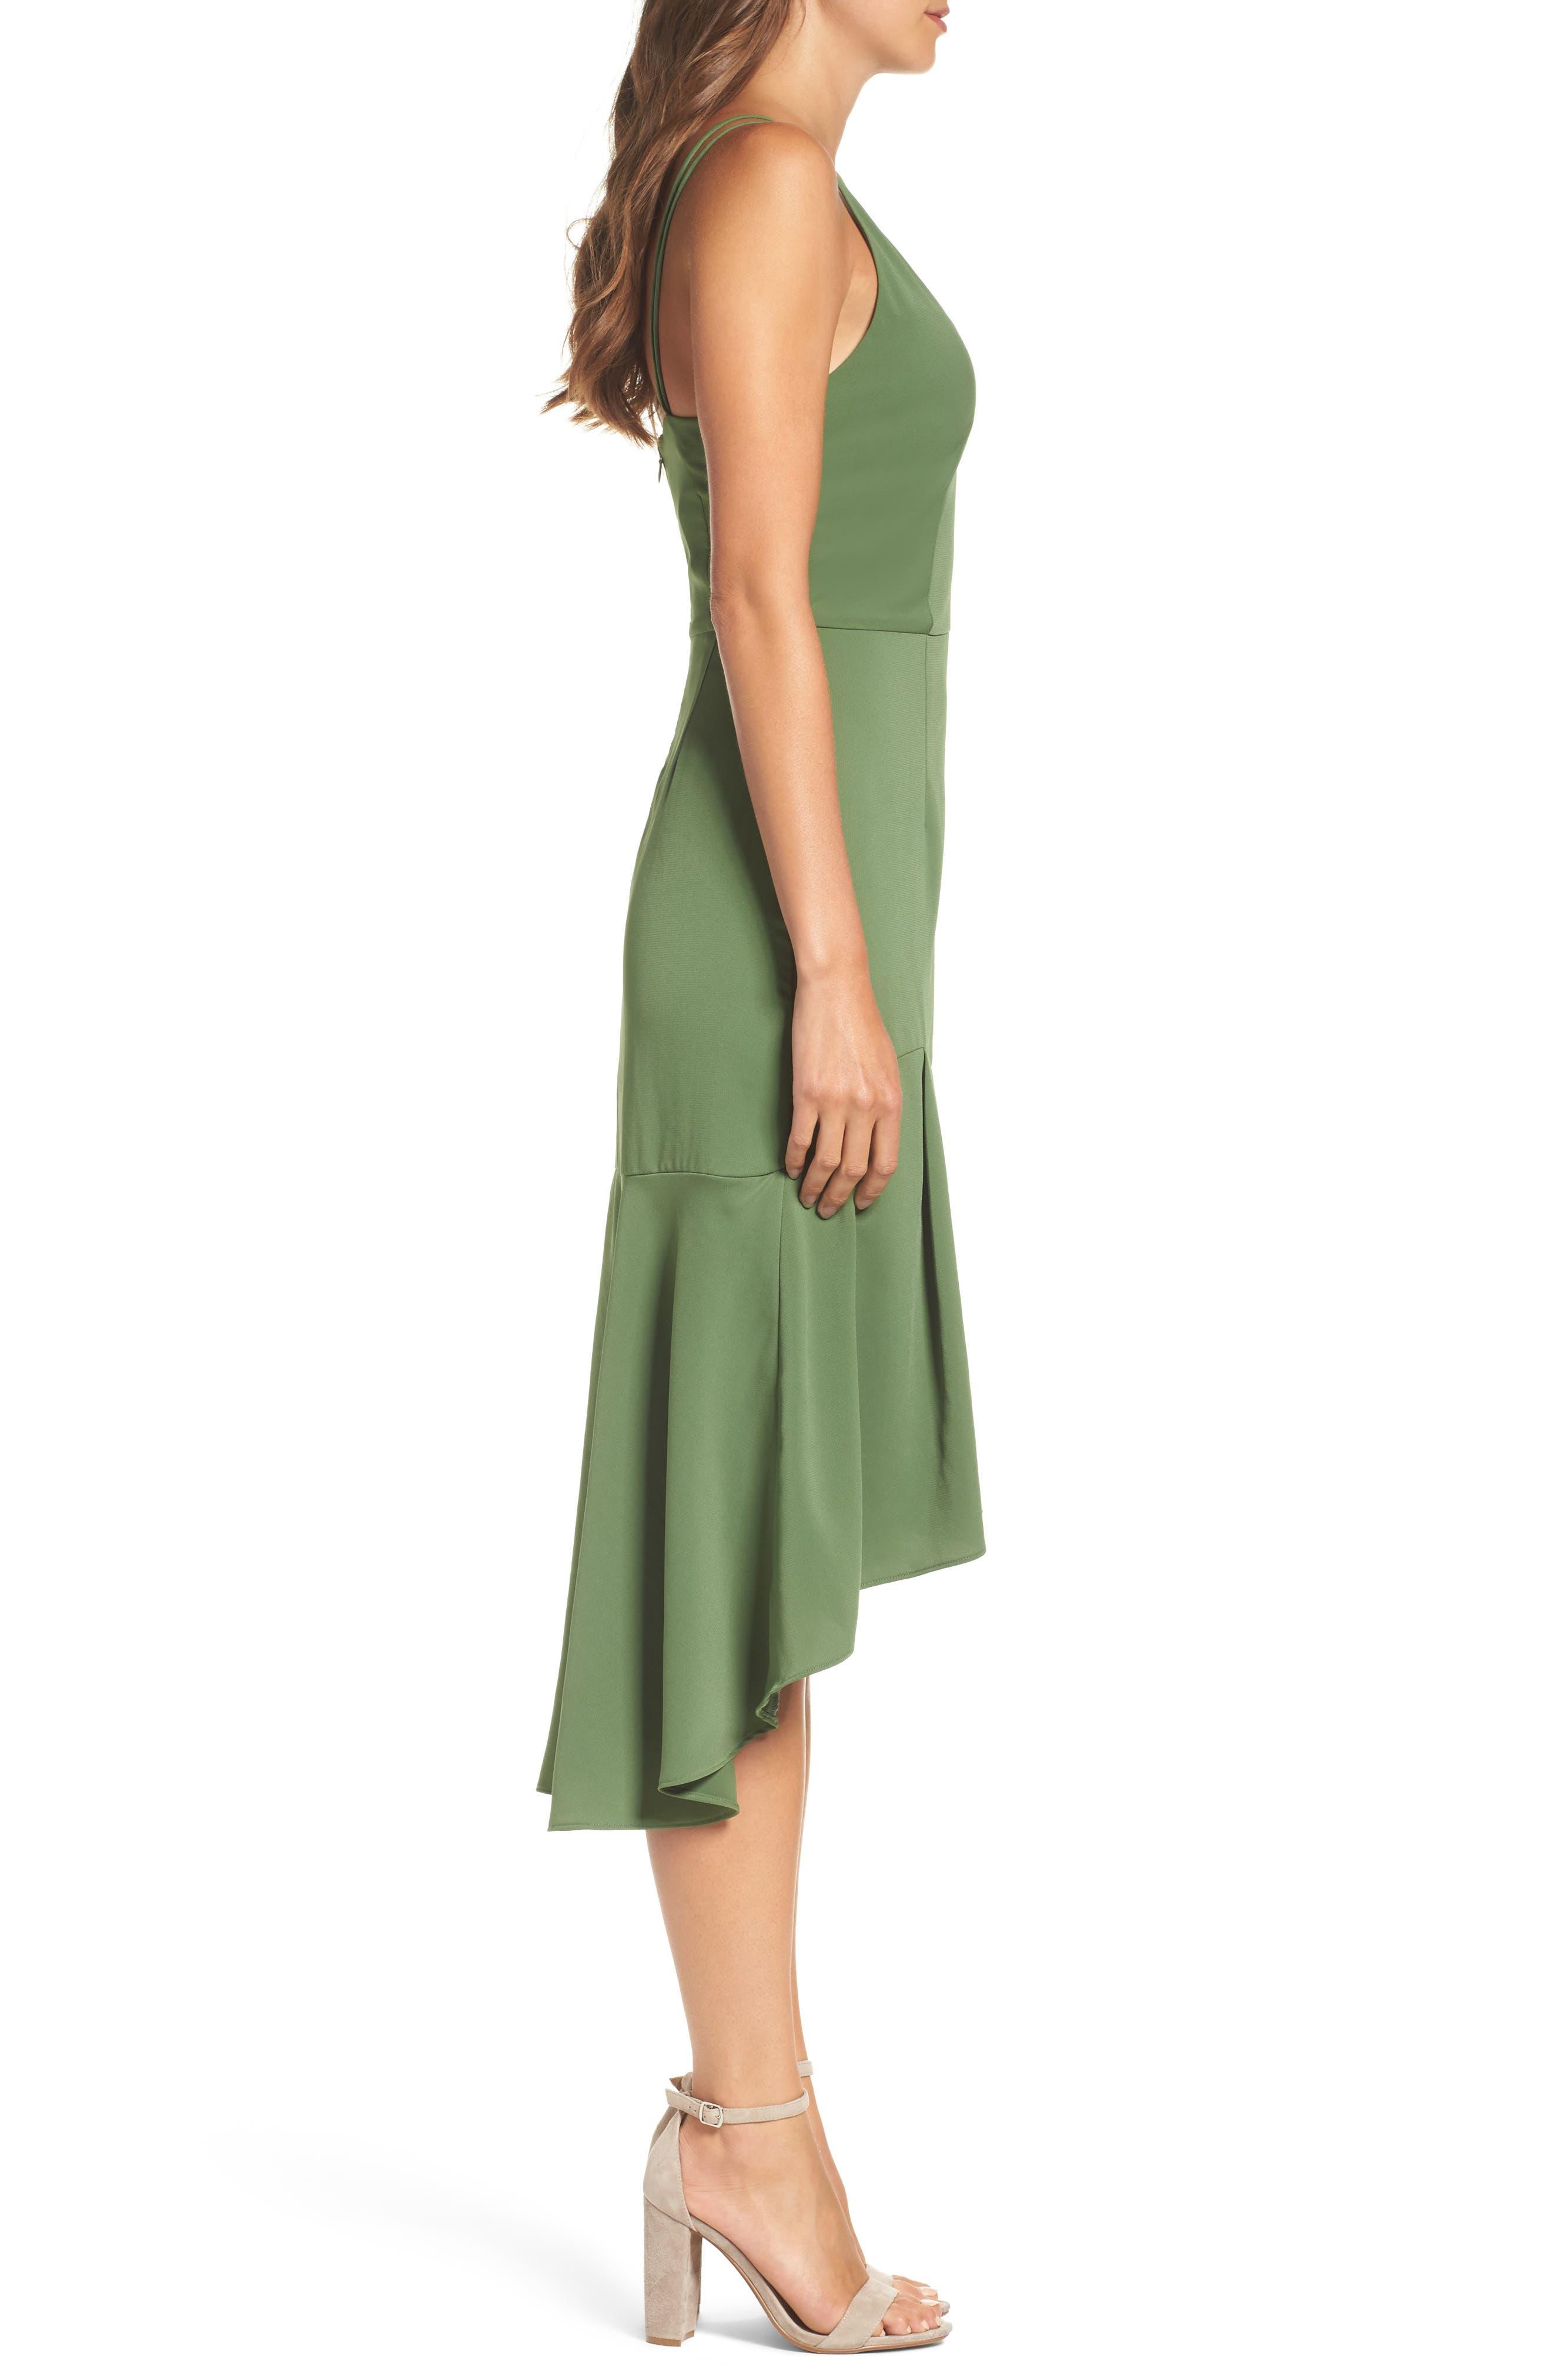 Lovine Midi Dress,                             Alternate thumbnail 3, color,                             Moss Green